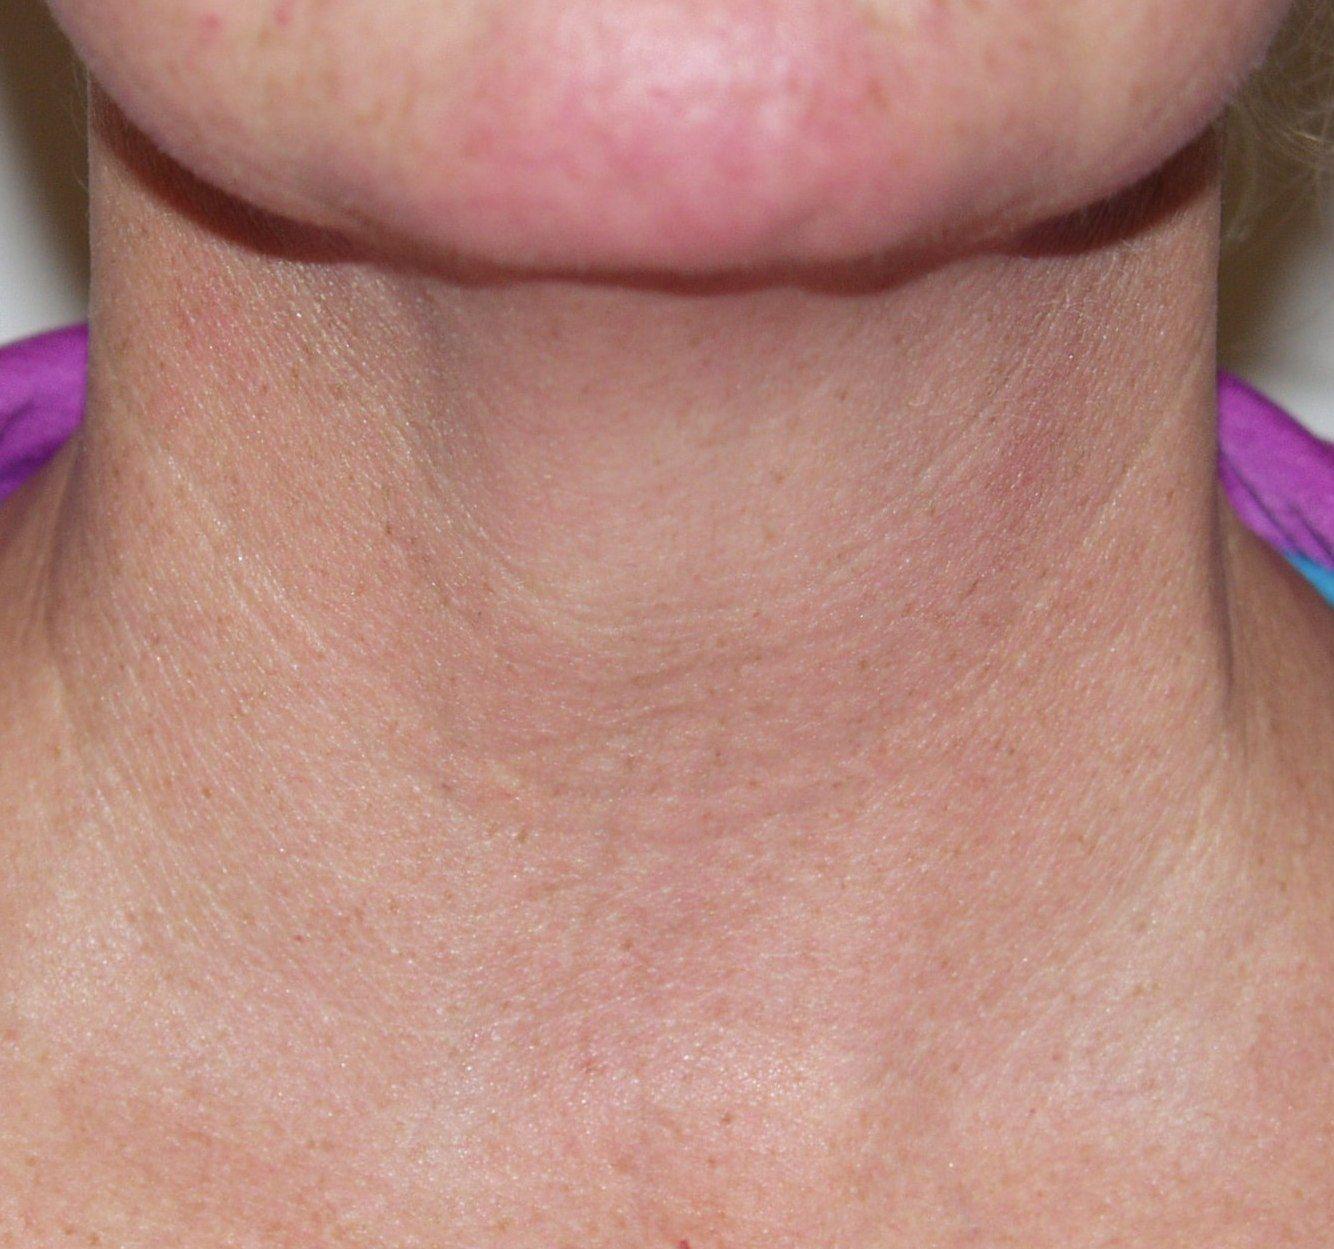 BEFORE  Micro-Botox: Skin texture is rough & irregular